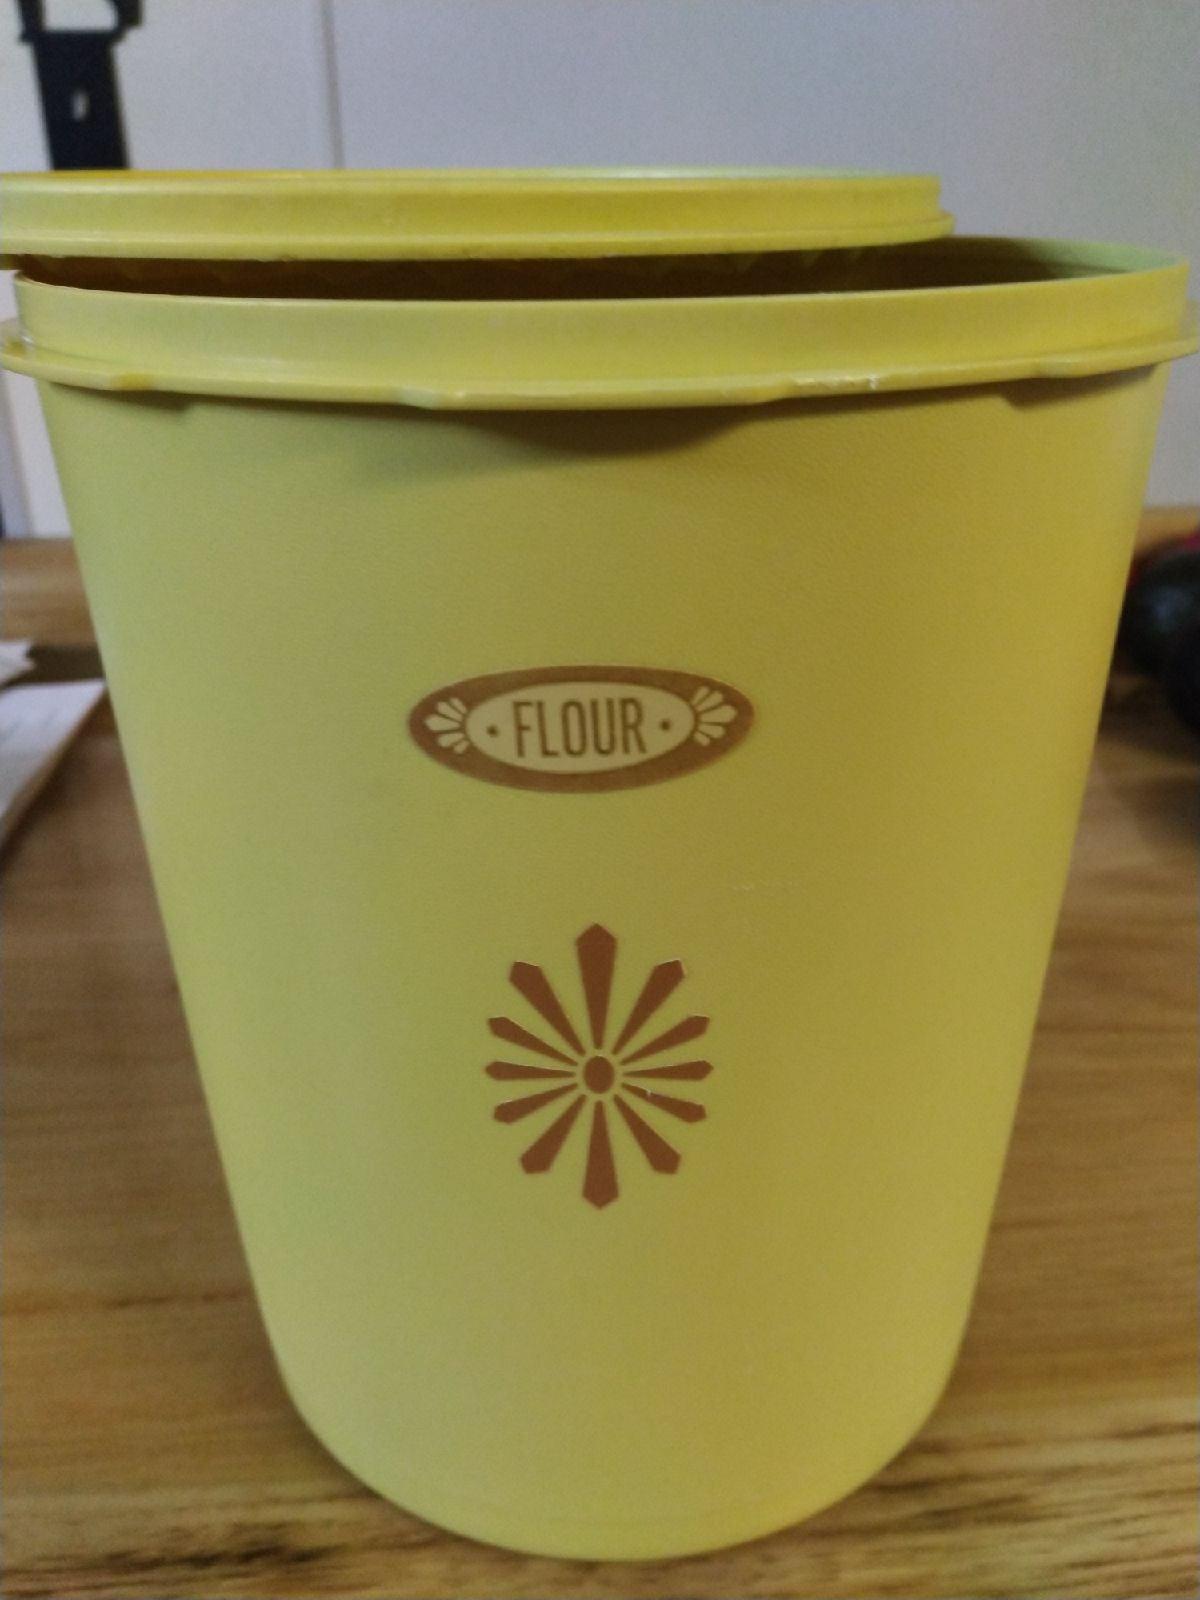 Vintage Tupperware flour container